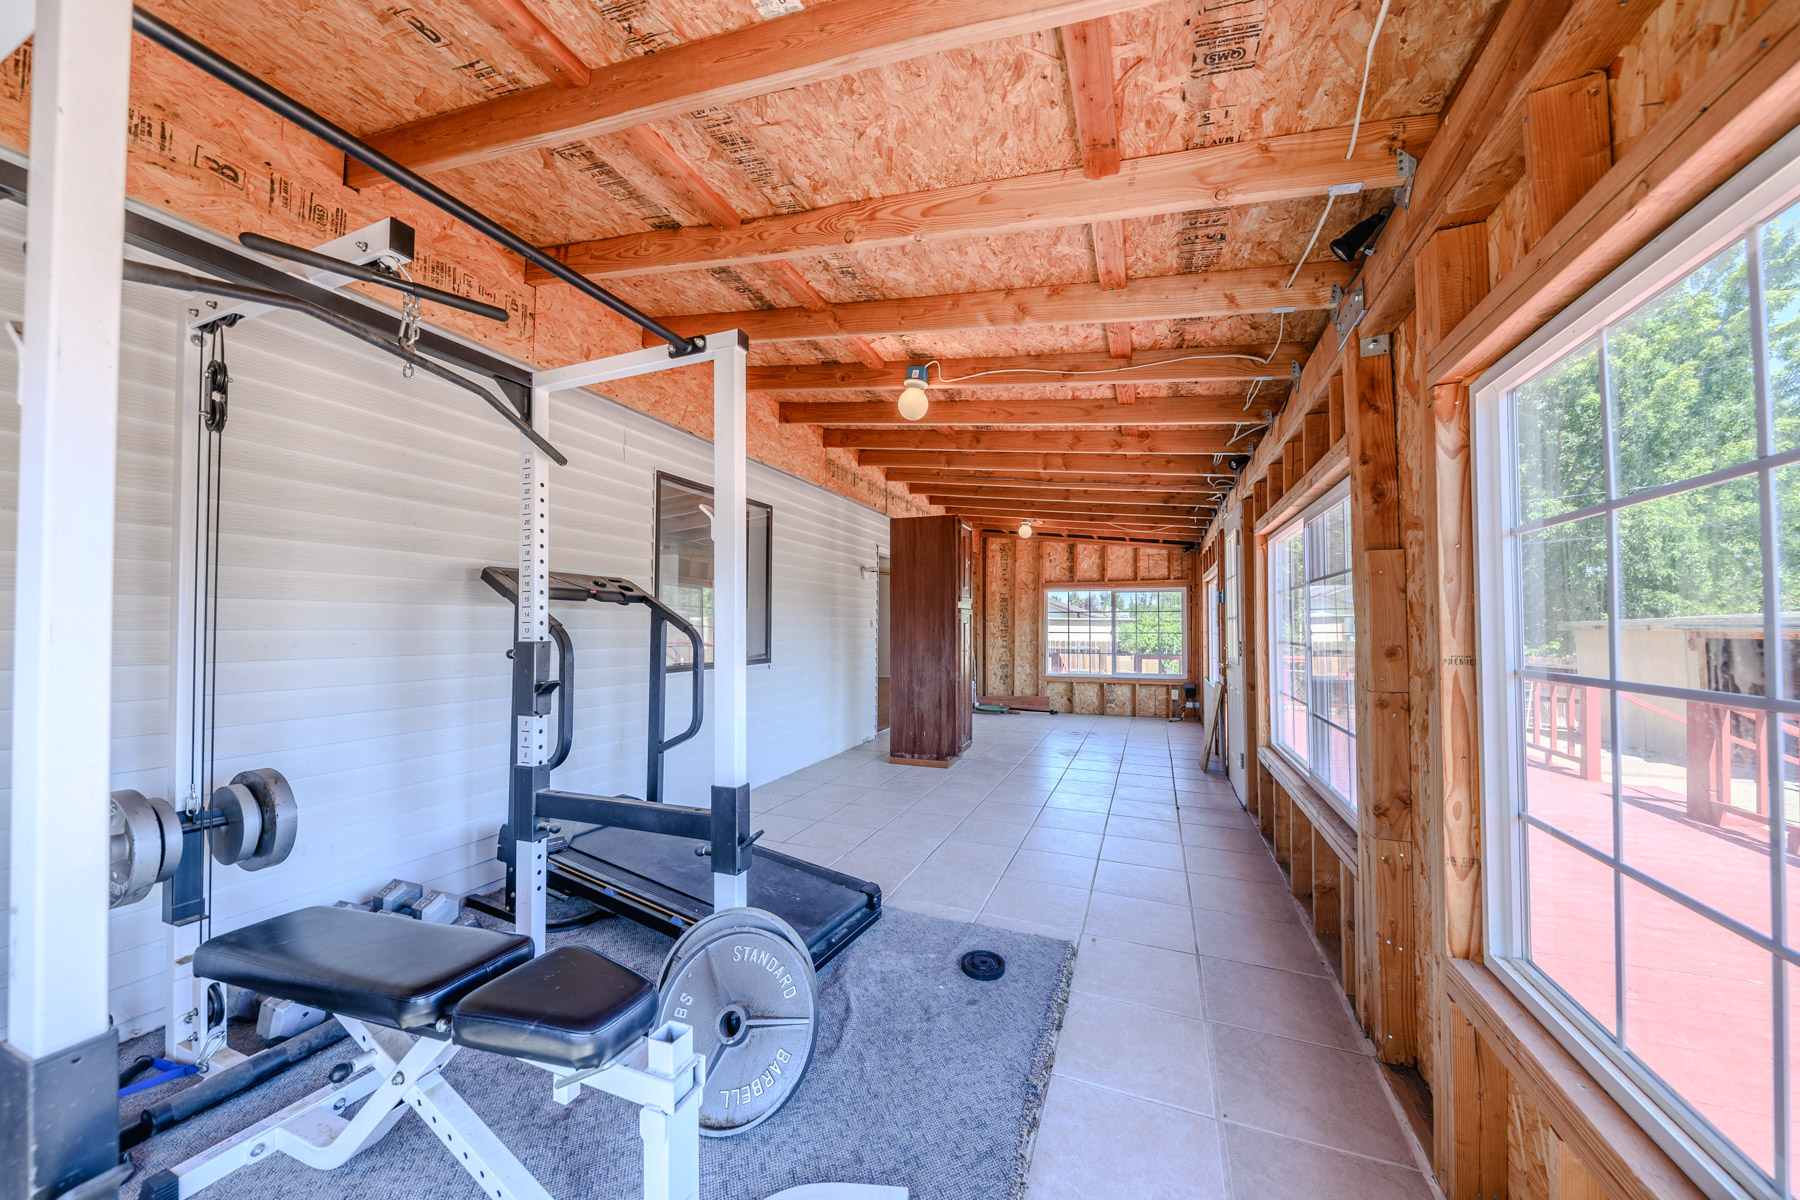 Additional photo for property listing at 10 N Tropicana Circle, Sparks 10 N Tropicana Circle 斯帕克斯, 内华达州 89436 美国